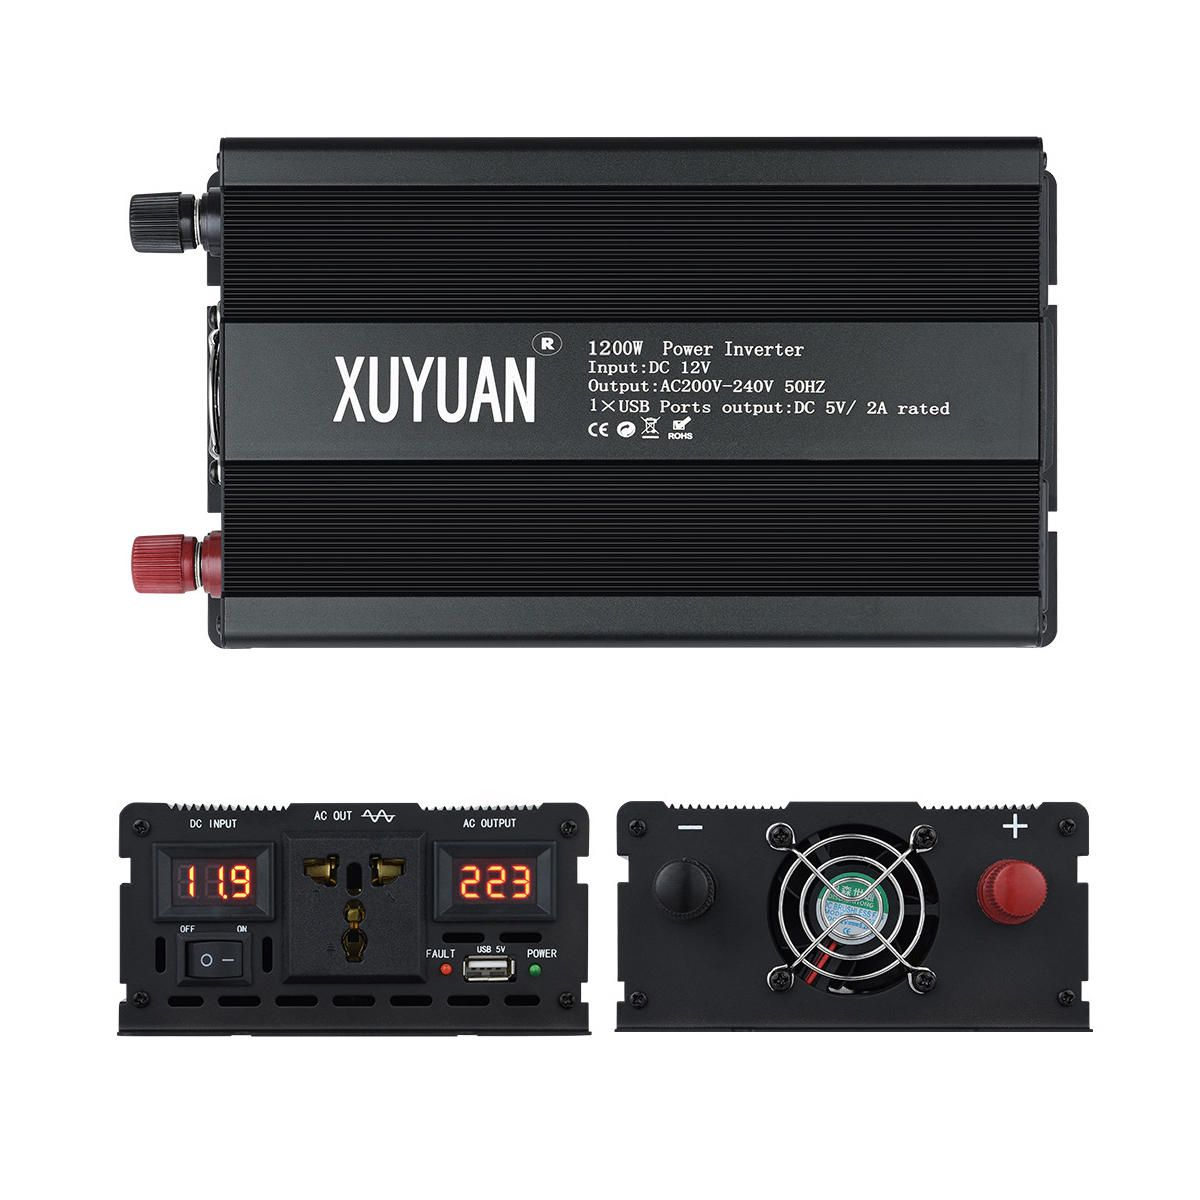 UTM US$84.01 Universal Socket 1200W Display Inverter DC12V/24V to AC 220V Pure Sine Wave Power Inverter